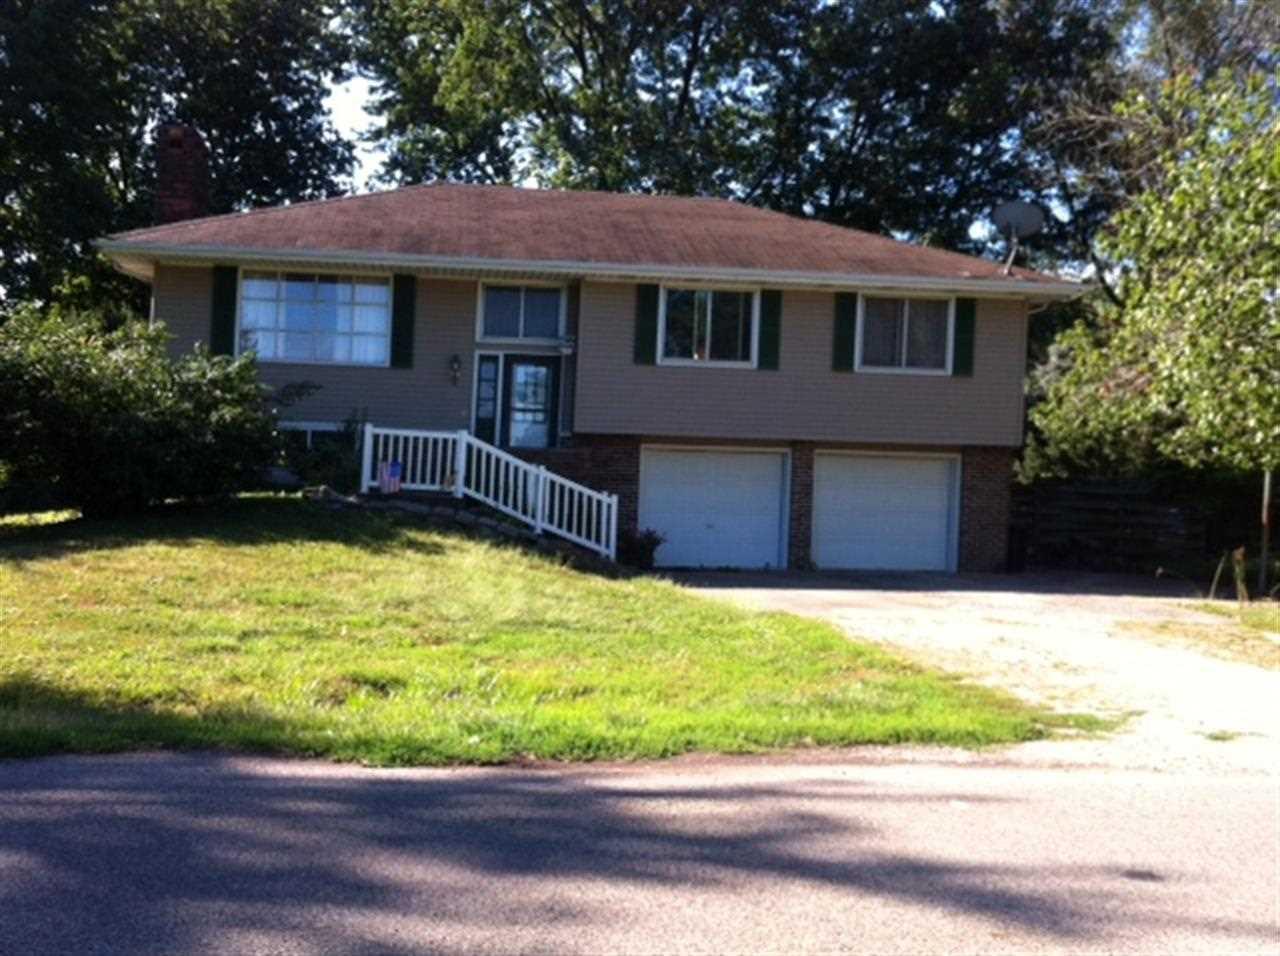 Real Estate for Sale, ListingId: 30761786, Mason City,IL62664